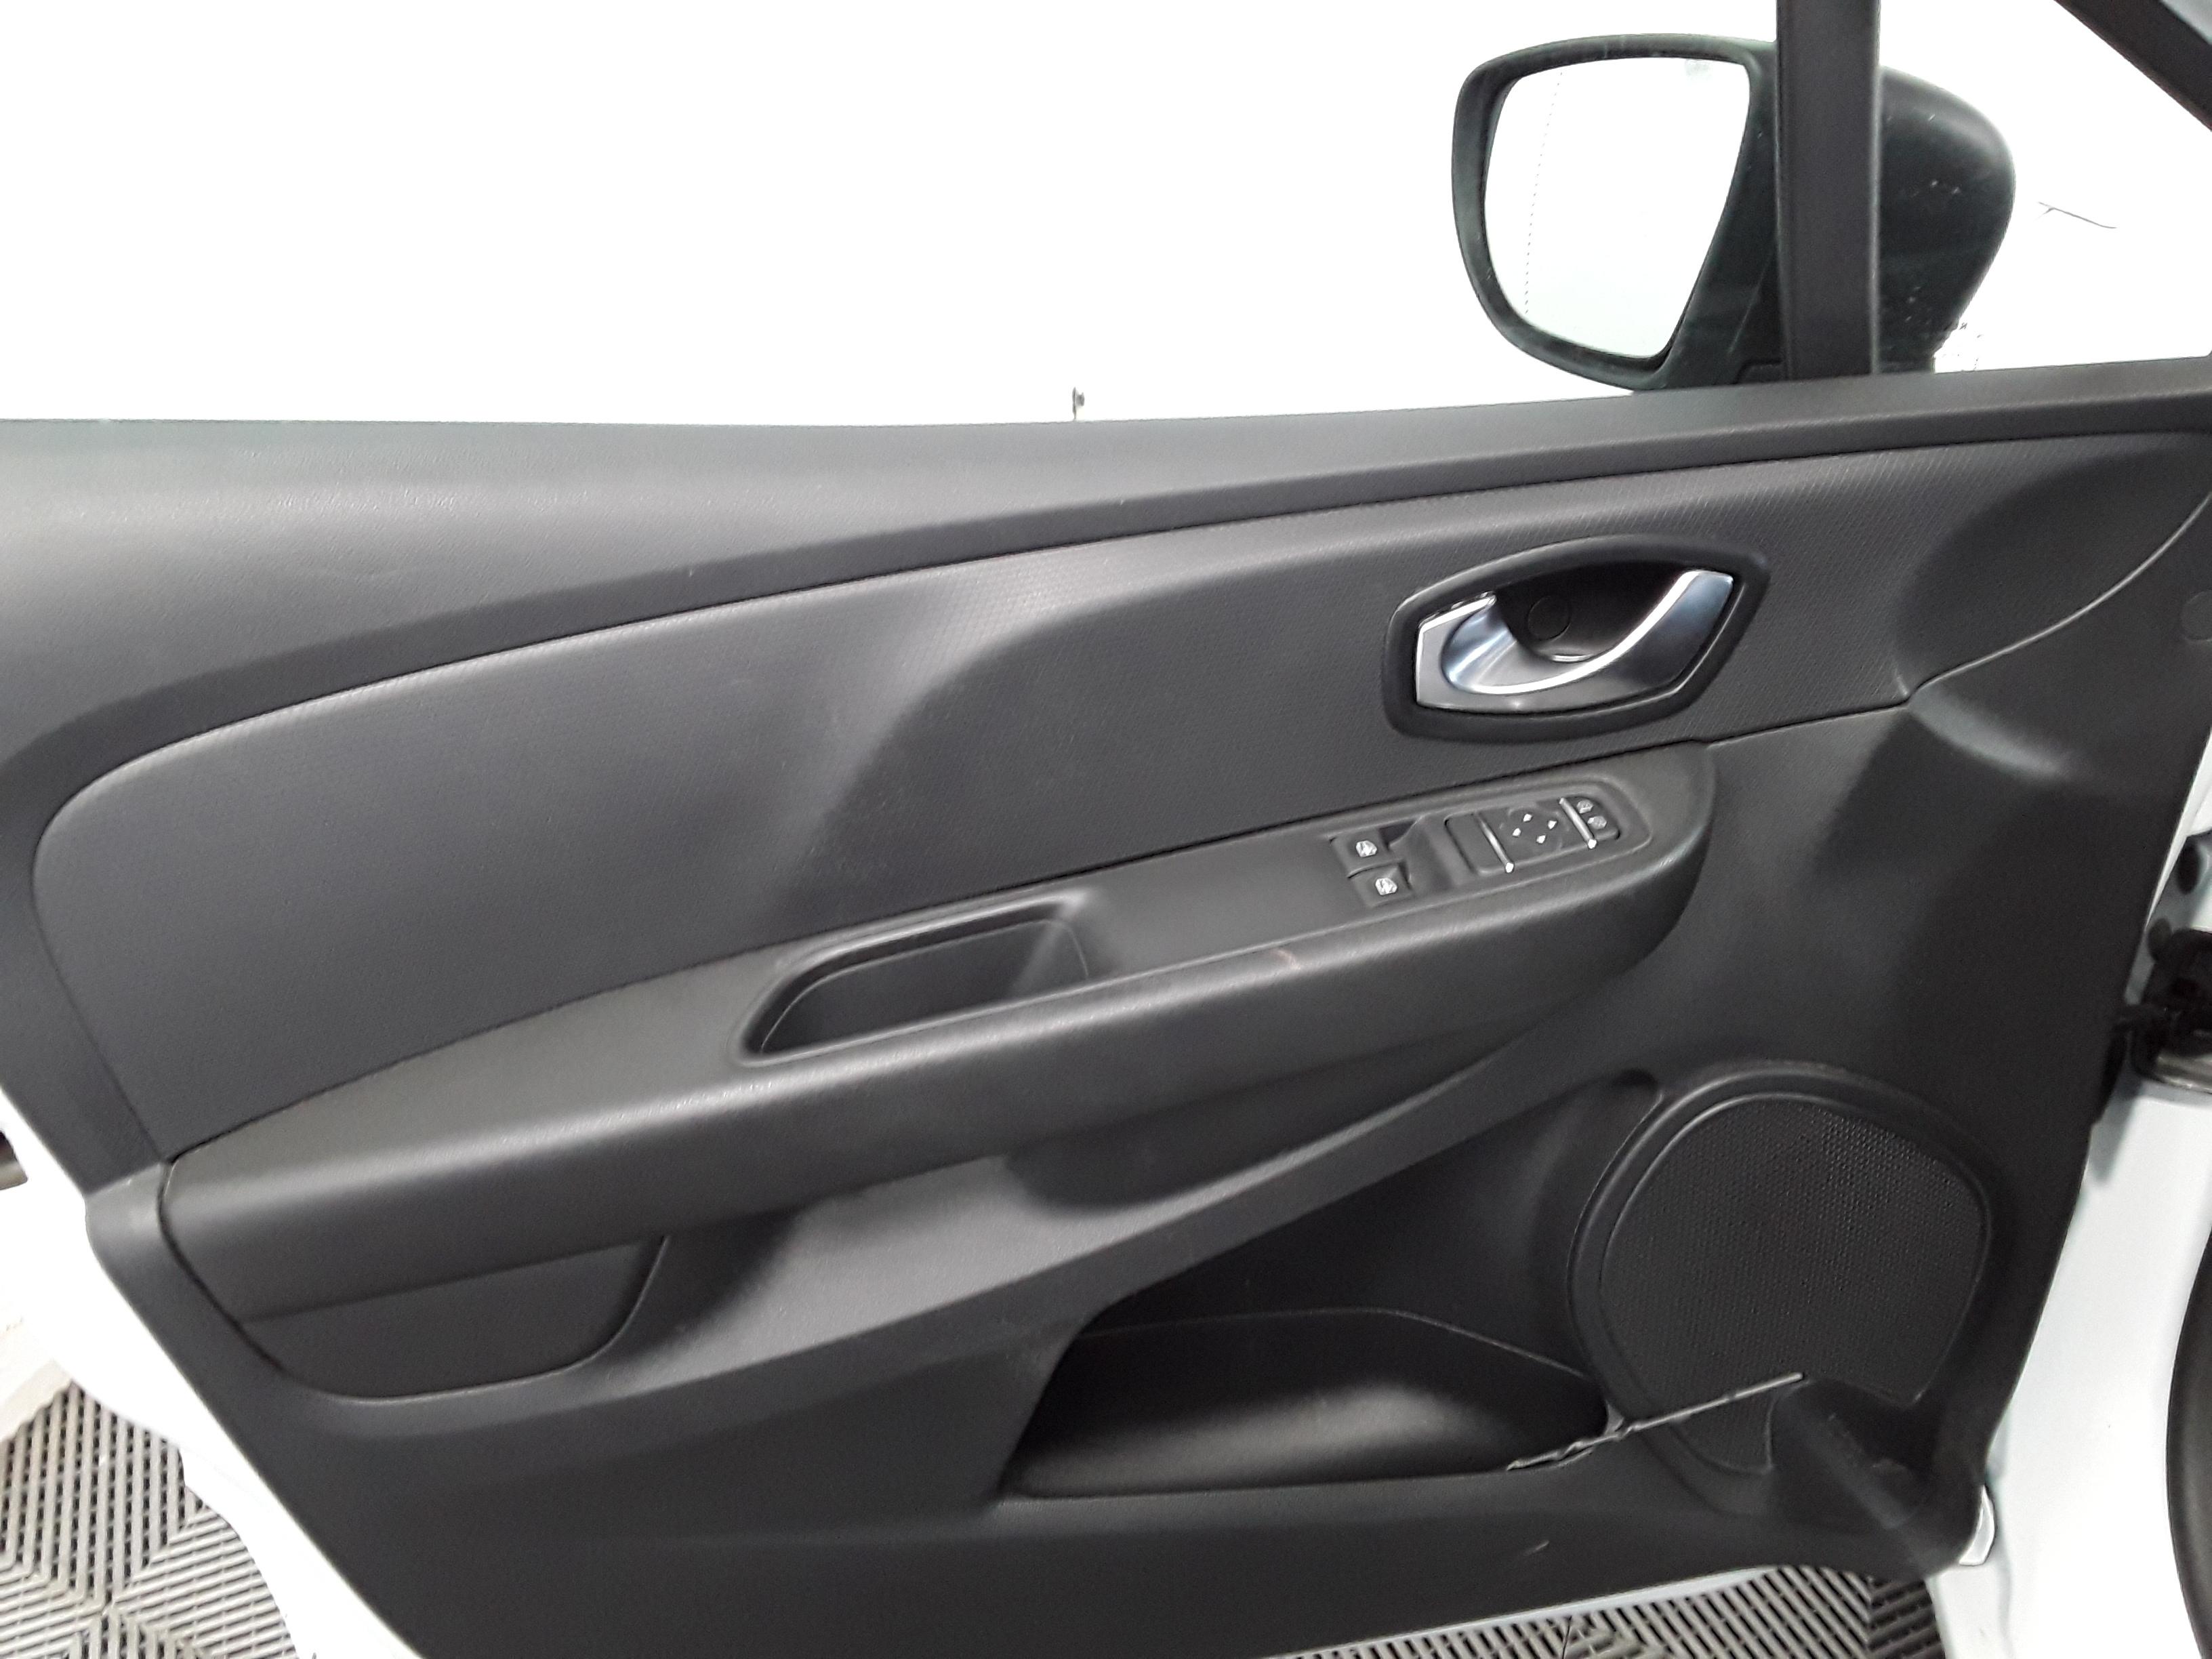 RENAULT CLIO IV SOCIETE 2018 à 6400 € - Photo n°12